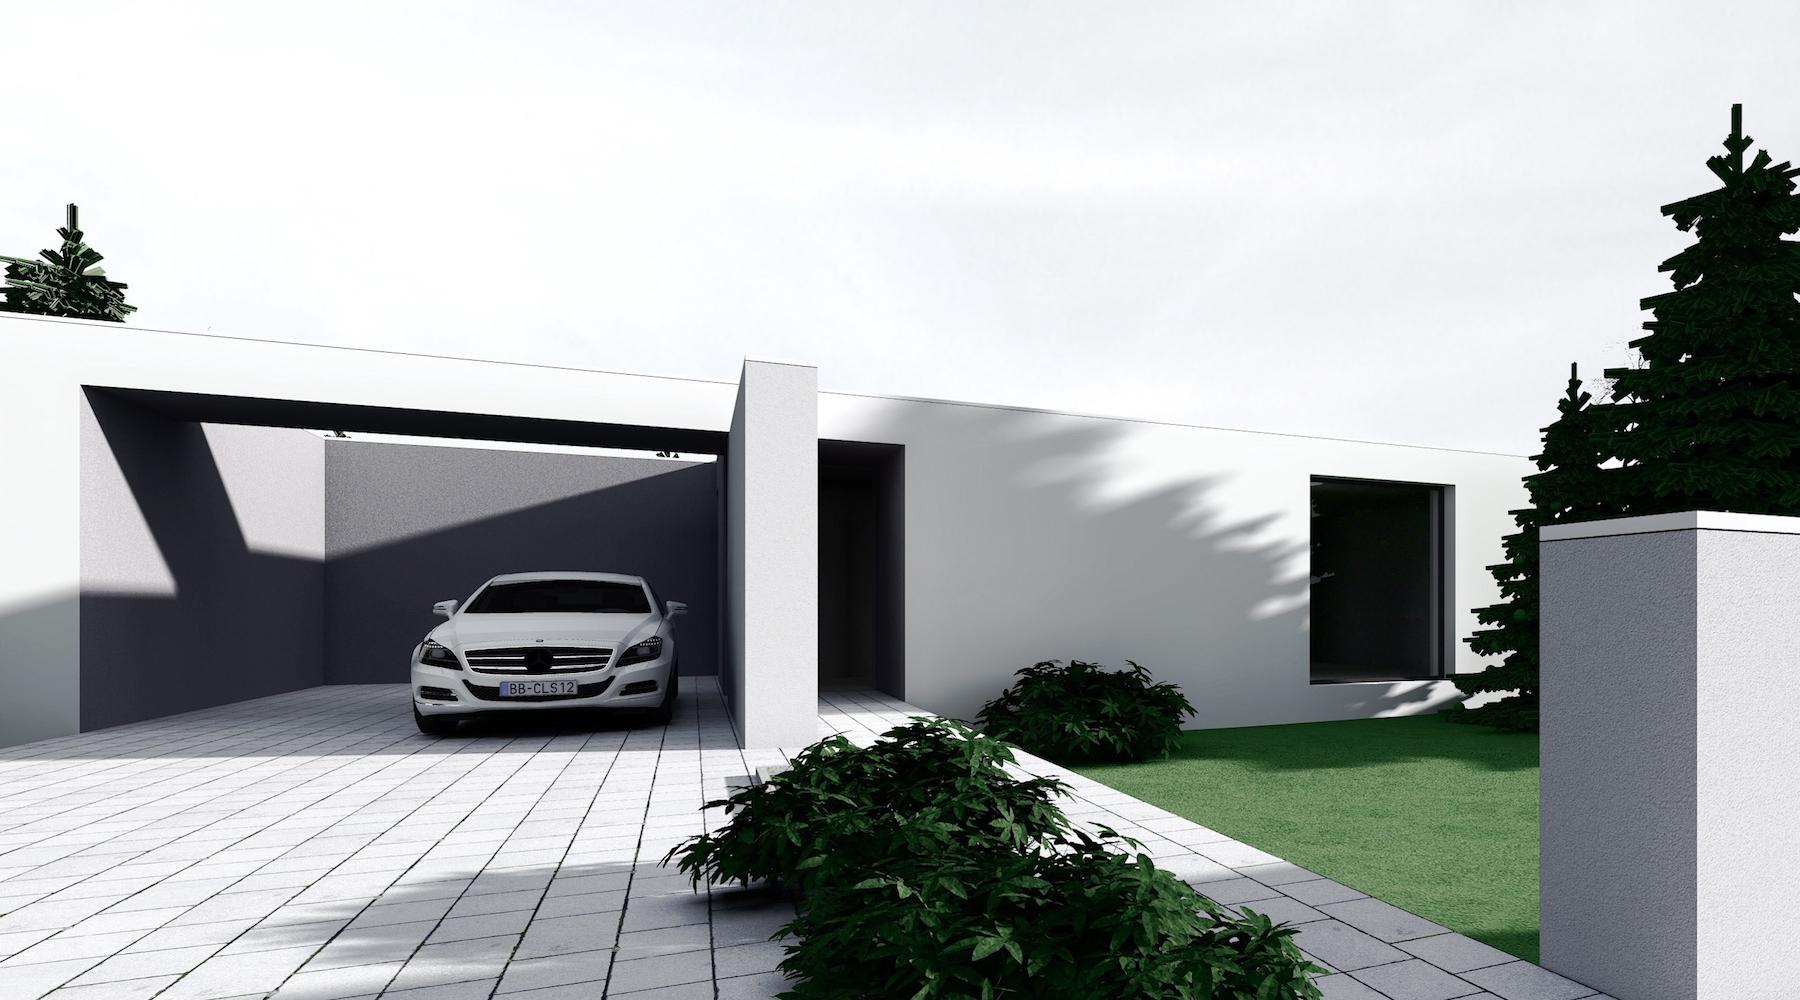 architekt_lodz_pv_house_inuti_03